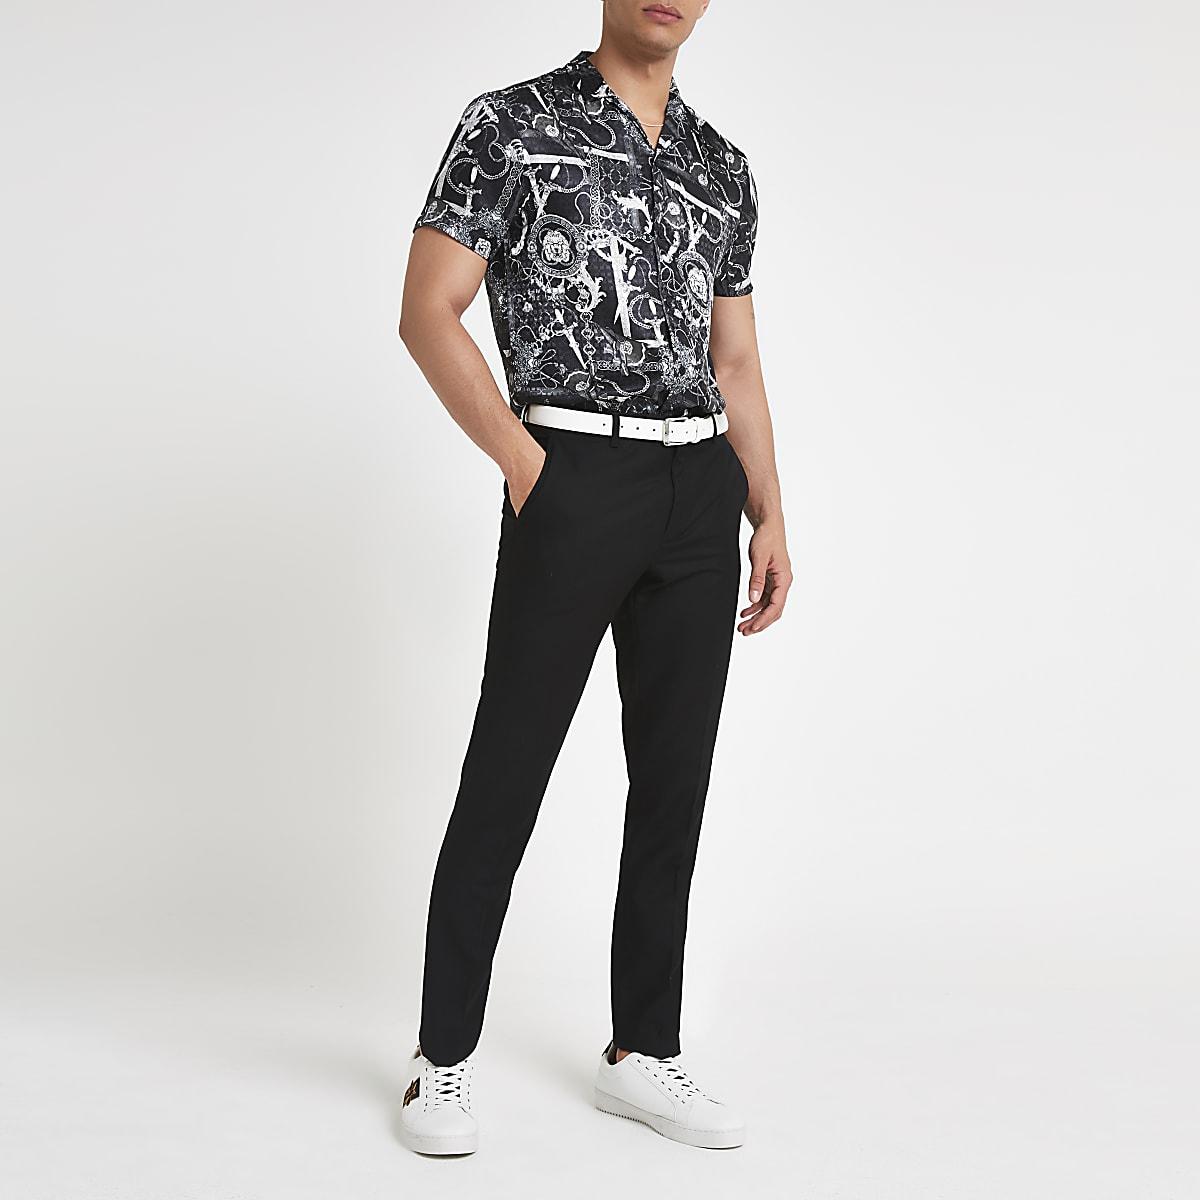 Schwarzes Kurzarmhemd mit Barockmuster